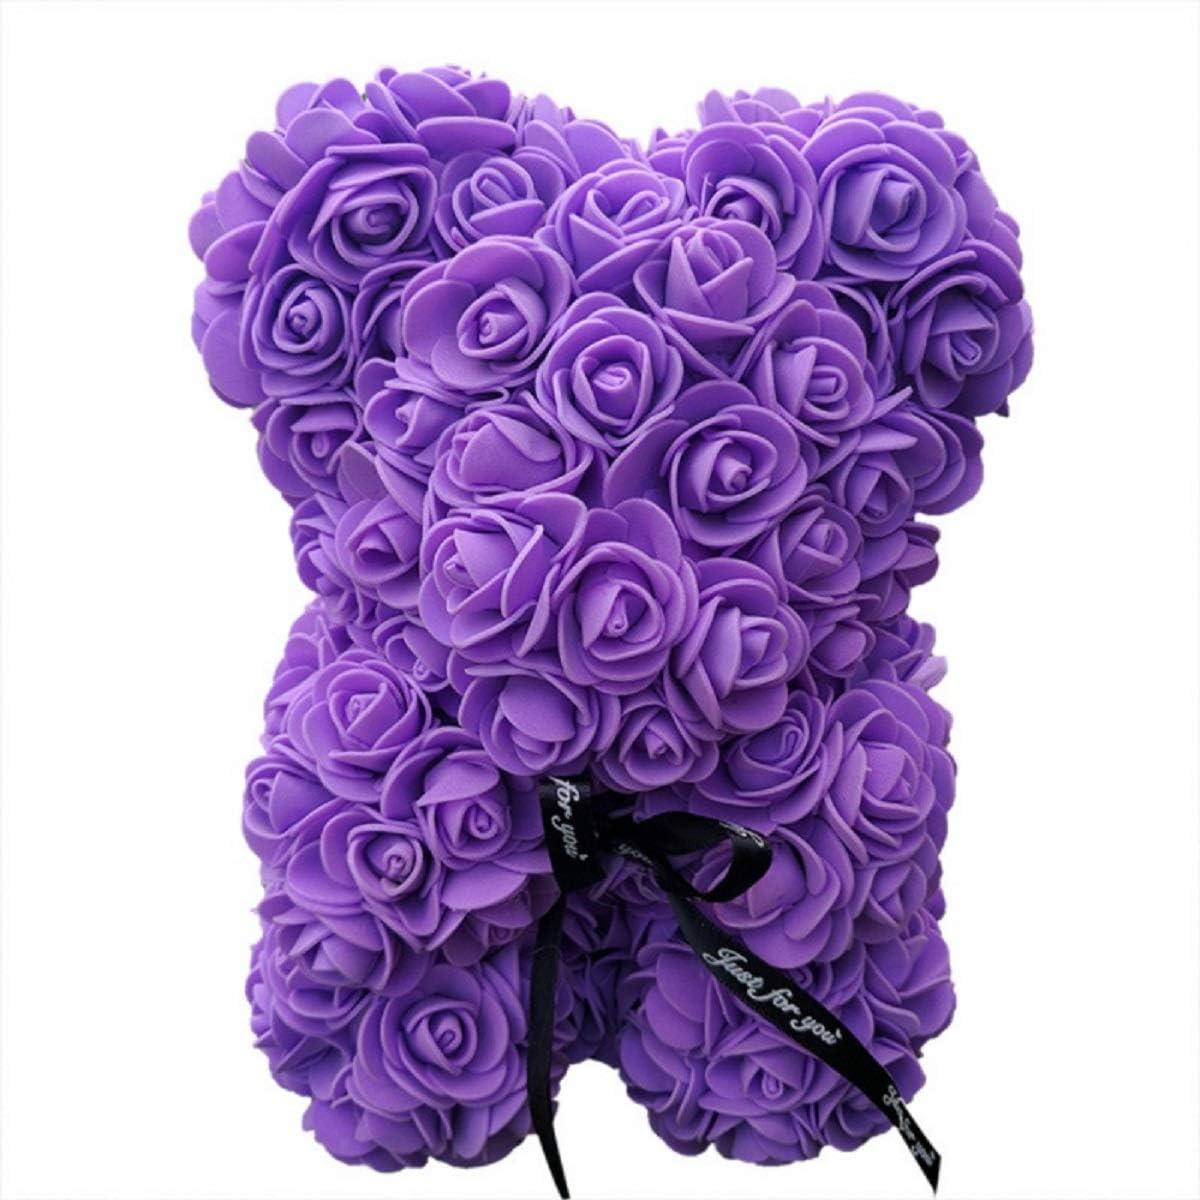 Oso de rosa de San Valentín creativo hecho a mano lindo jabón rosa oso construido con flores artificiales oso de juguete para regalo de cumpleaños regalo especial regalo de día